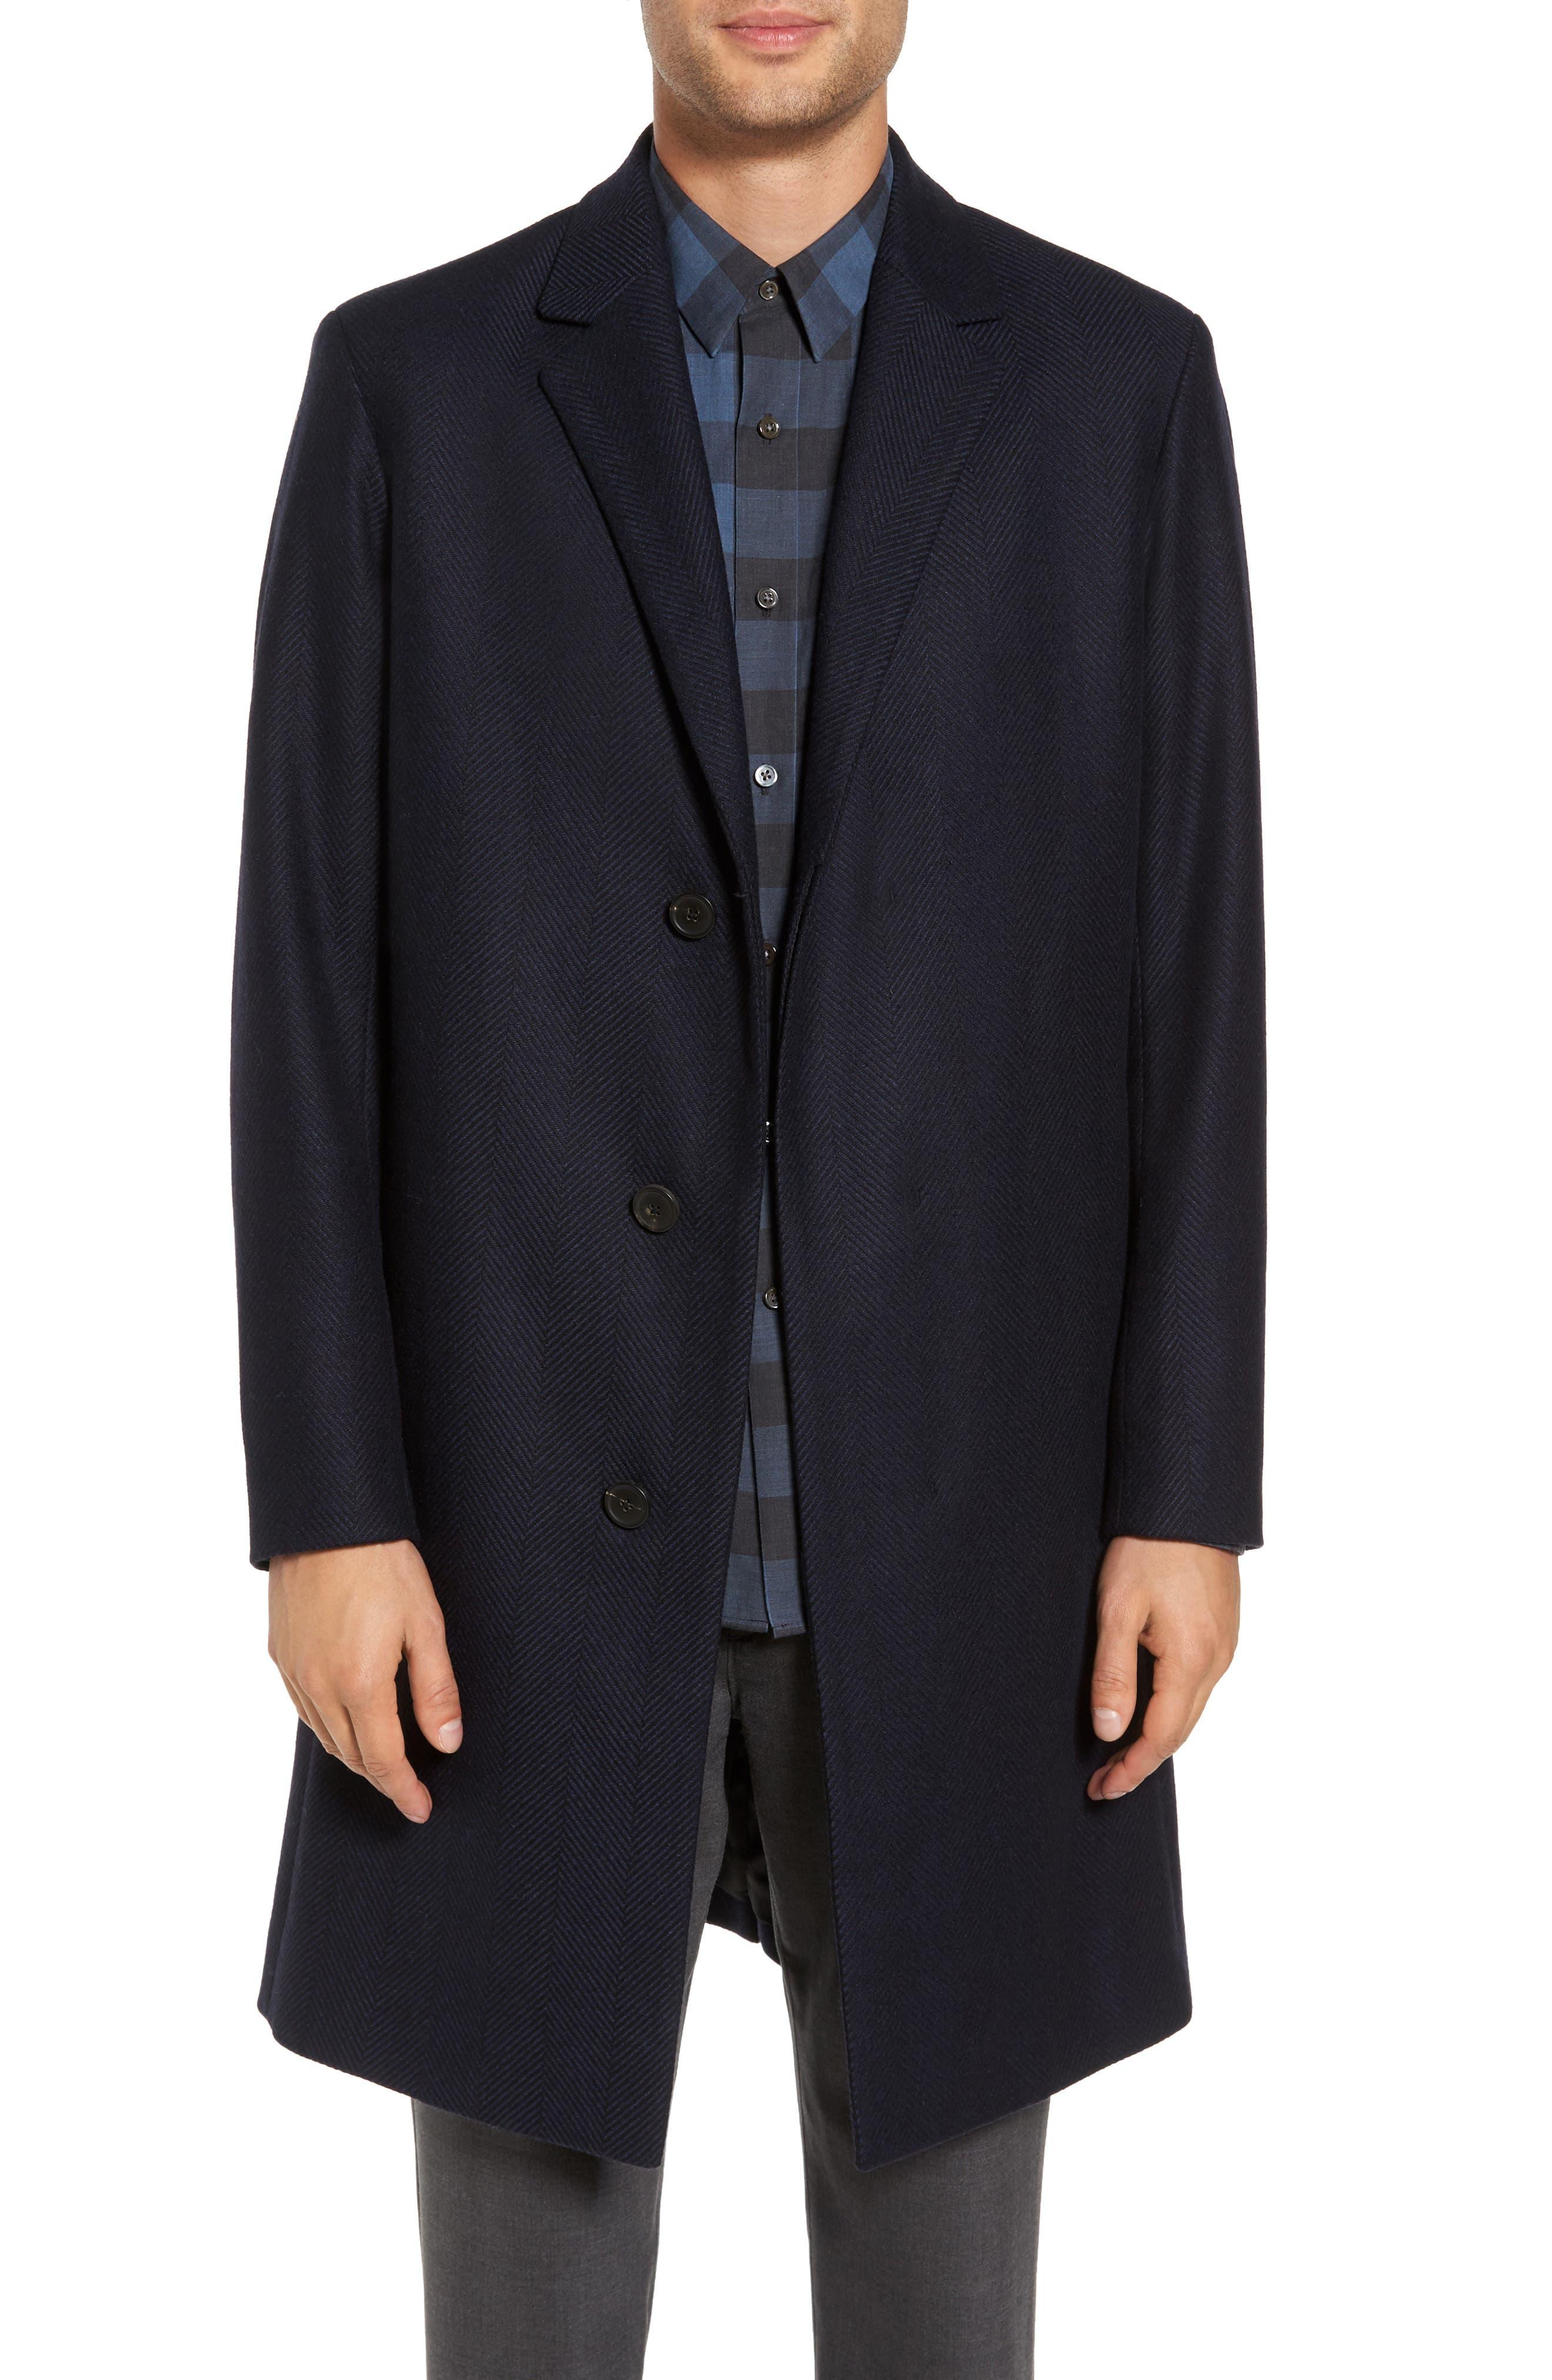 Main Image - Theory Bower Herringbone Wool Blend Topcoat